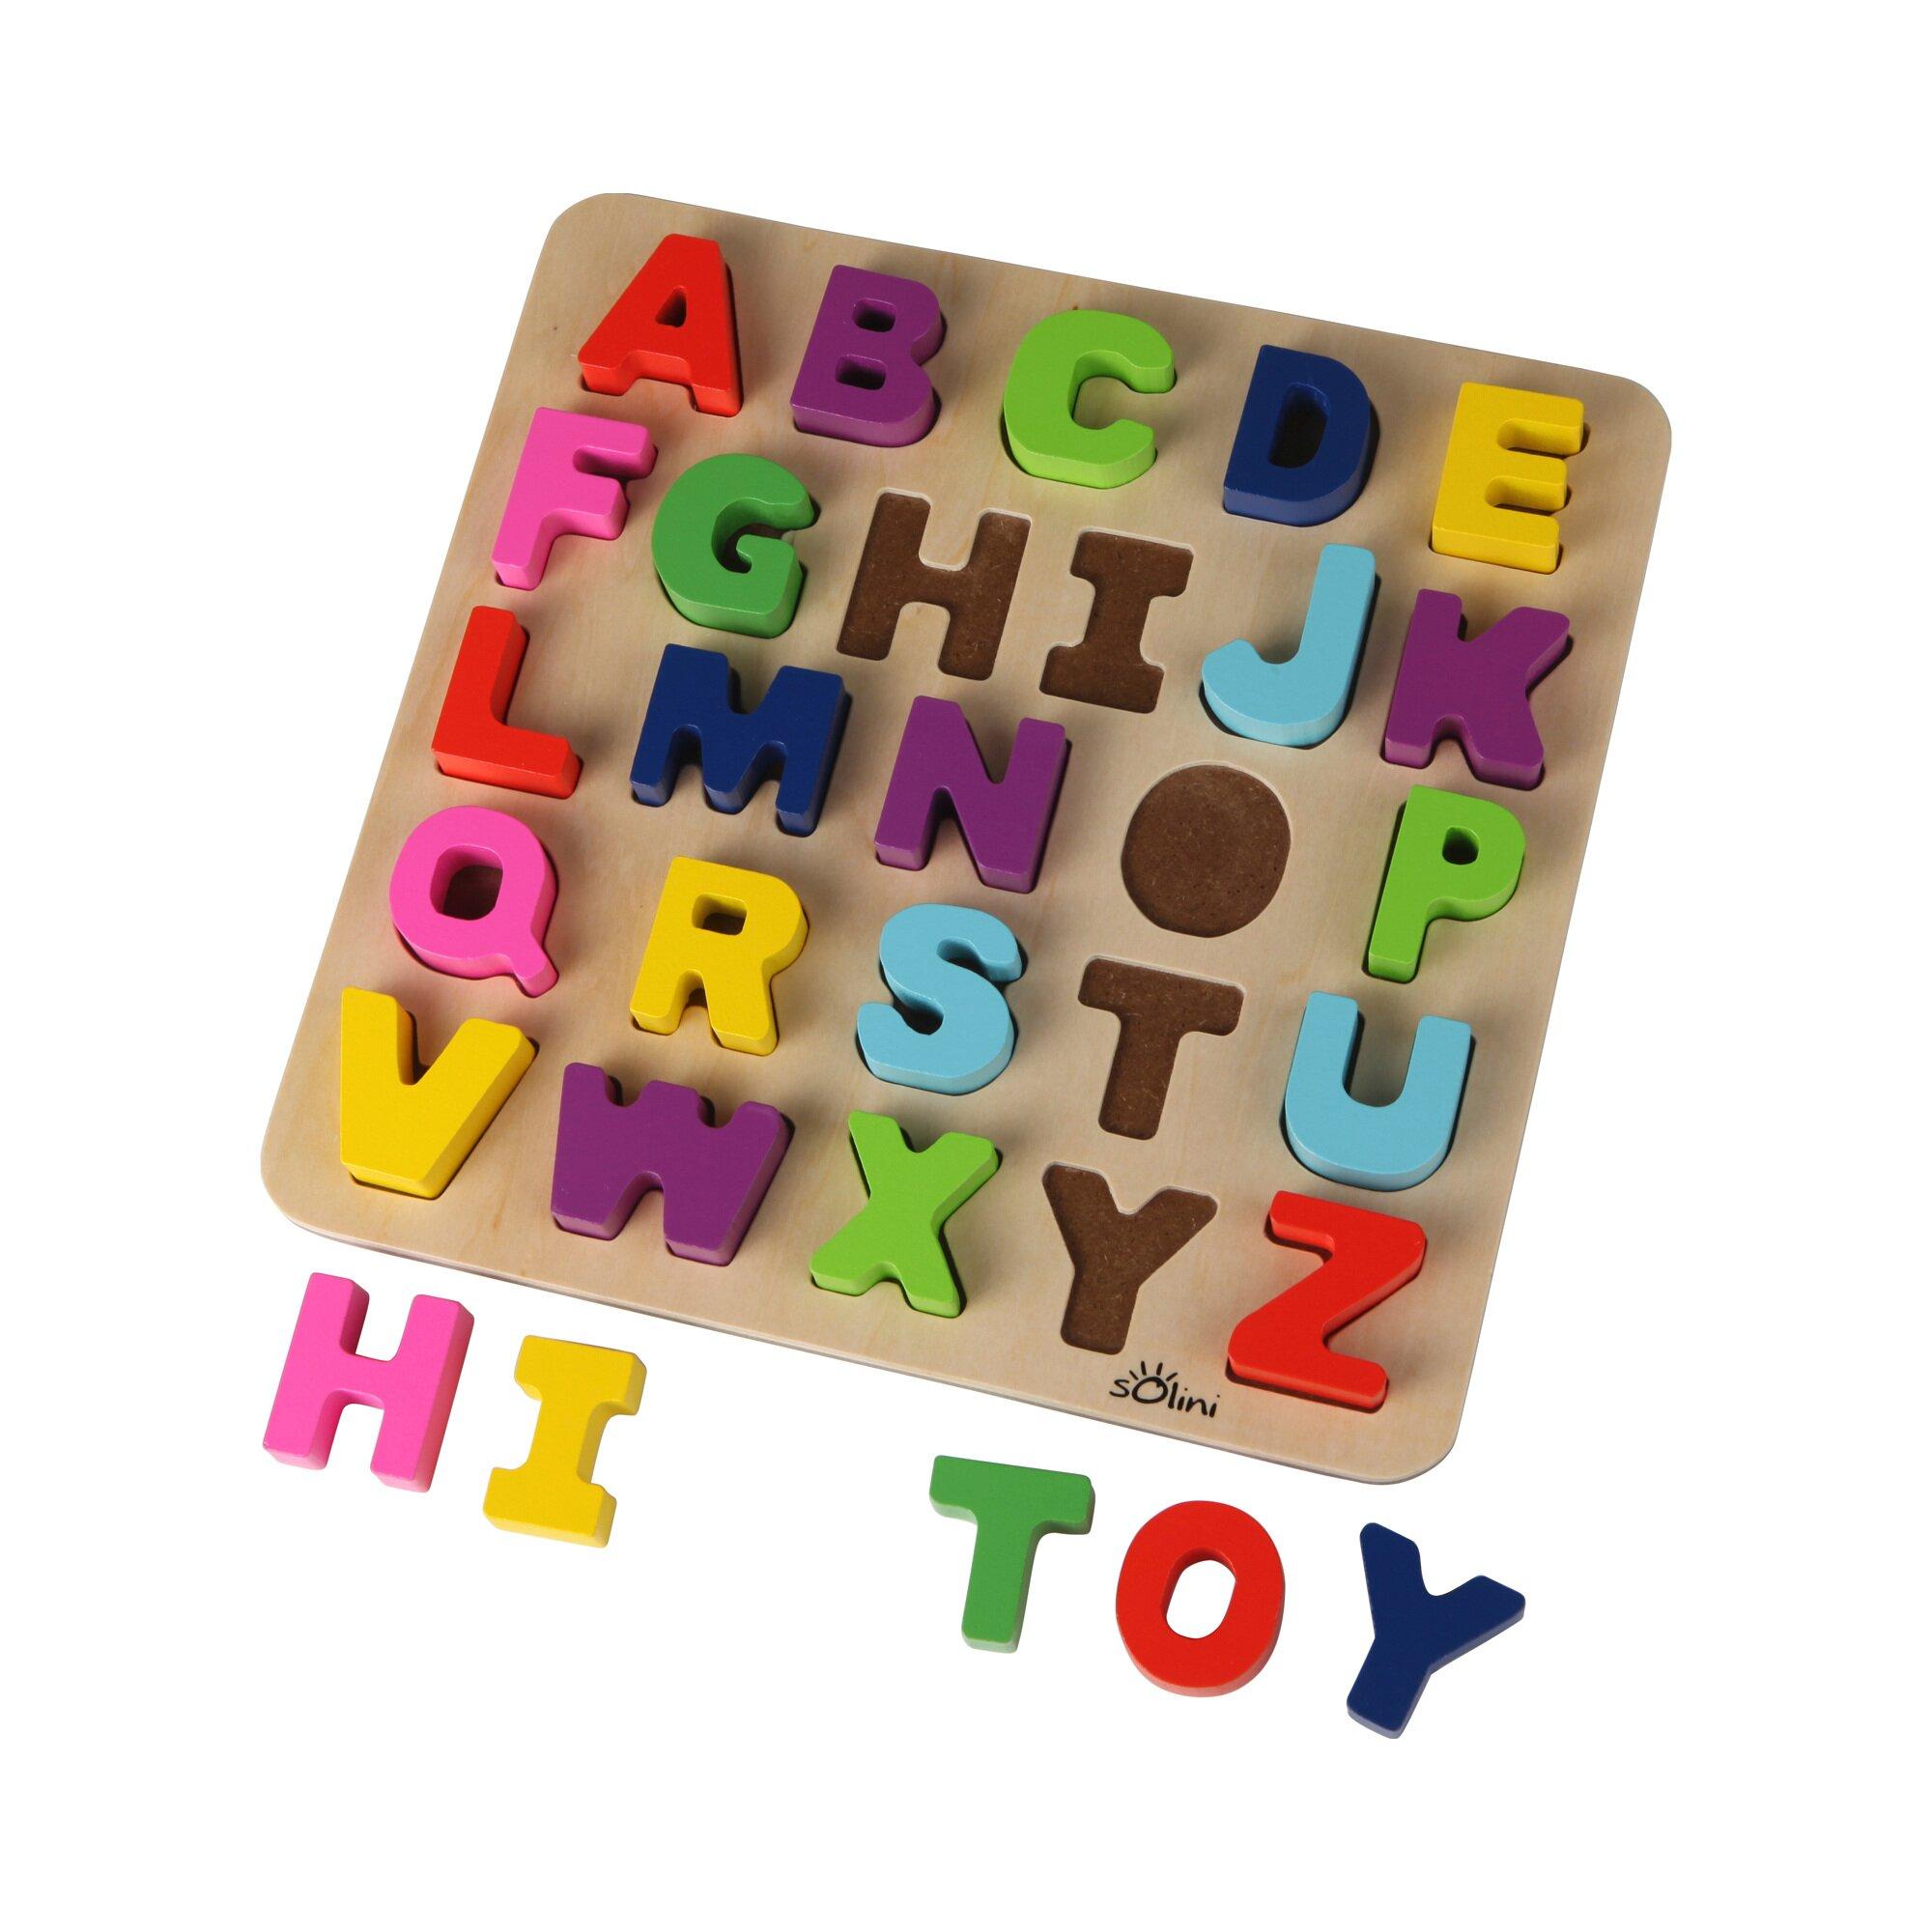 solini-holz-abc-buchstaben-puzzle